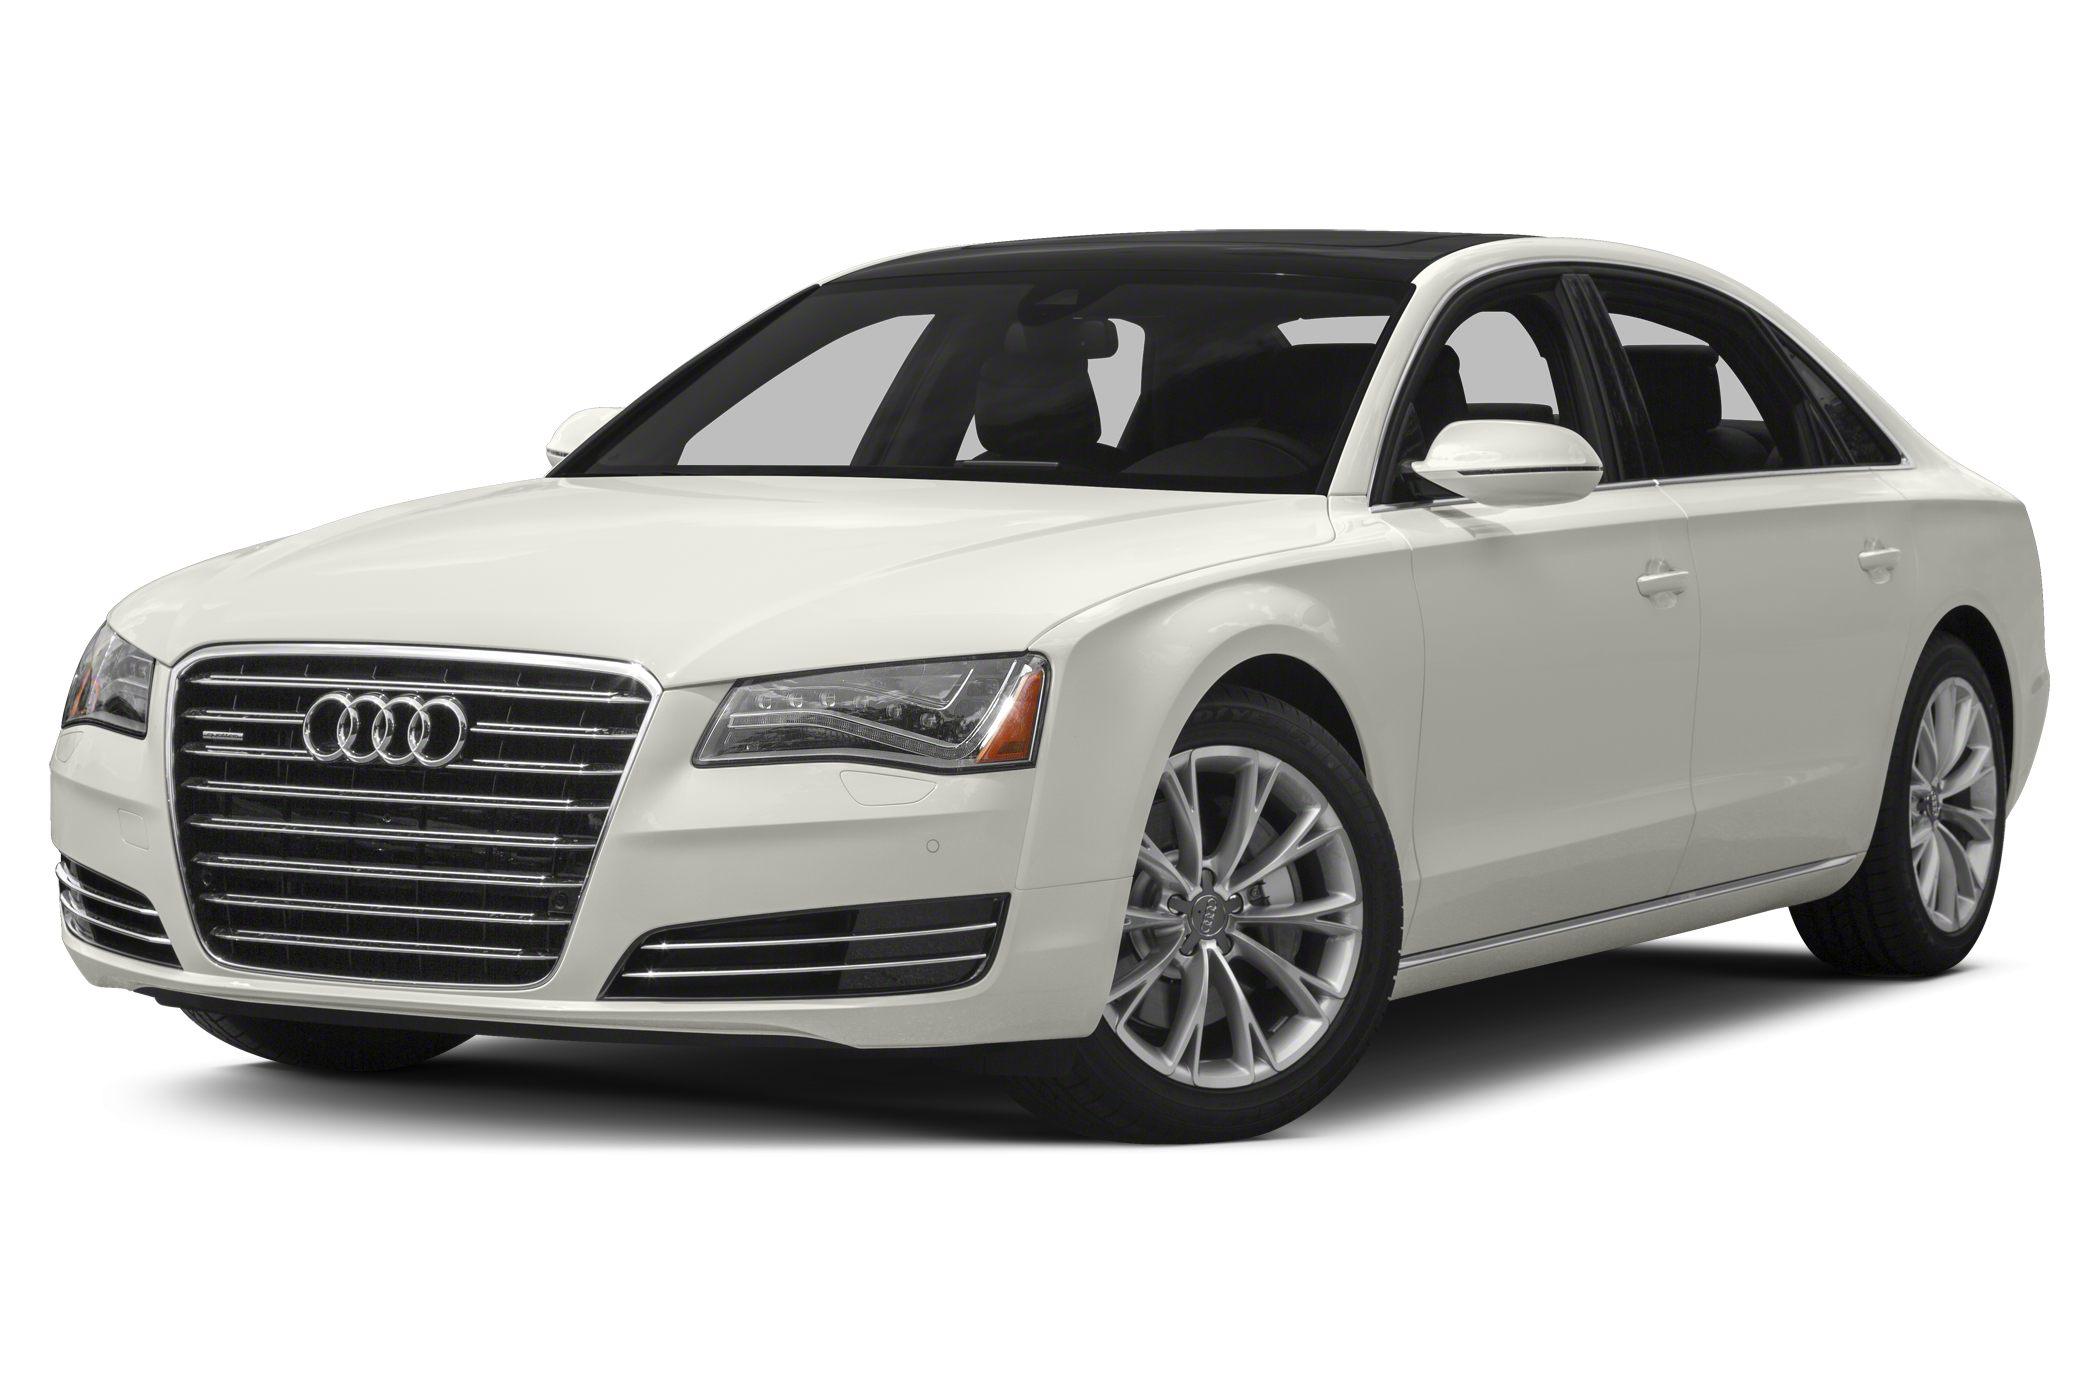 New Bmw Used Luxury Car Dealer Serving Washington Dc